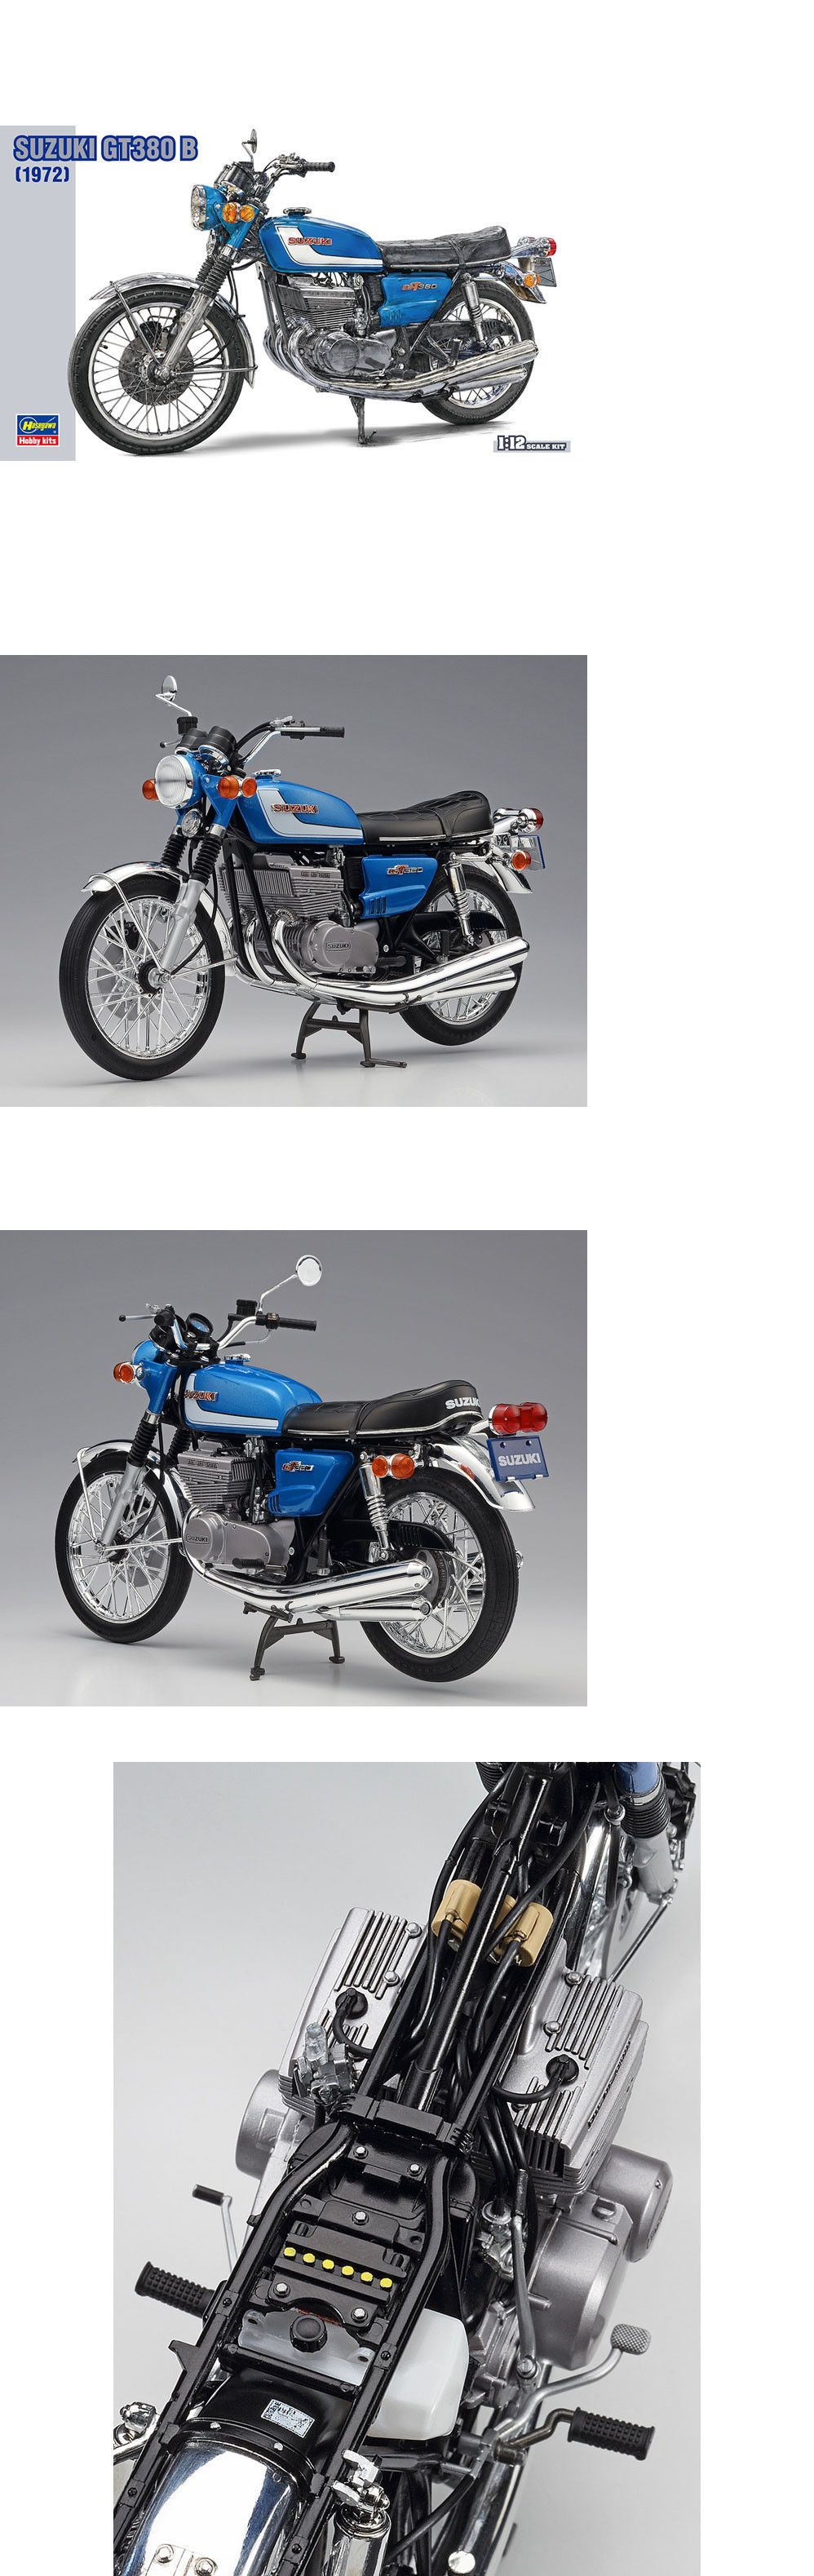 Motorcycle 2591: Hasegawa #21505 1 12 Suzuki Gt380 B -> BUY